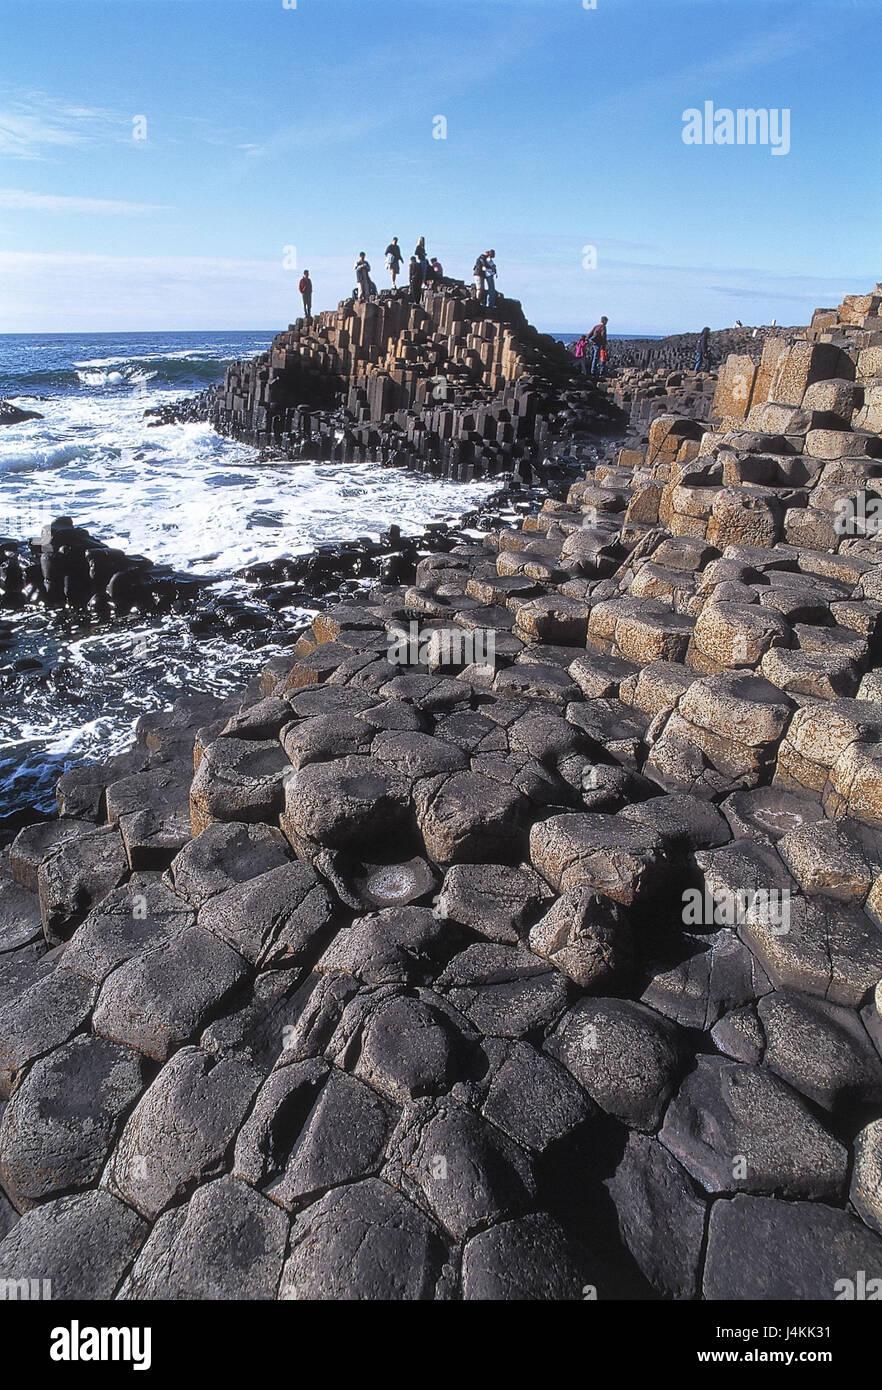 Northern Ireland, county Antrim, bile coast, Giant's Causeway, basalt pillars, tourists, sea Europe, Western Europe, Stock Photo